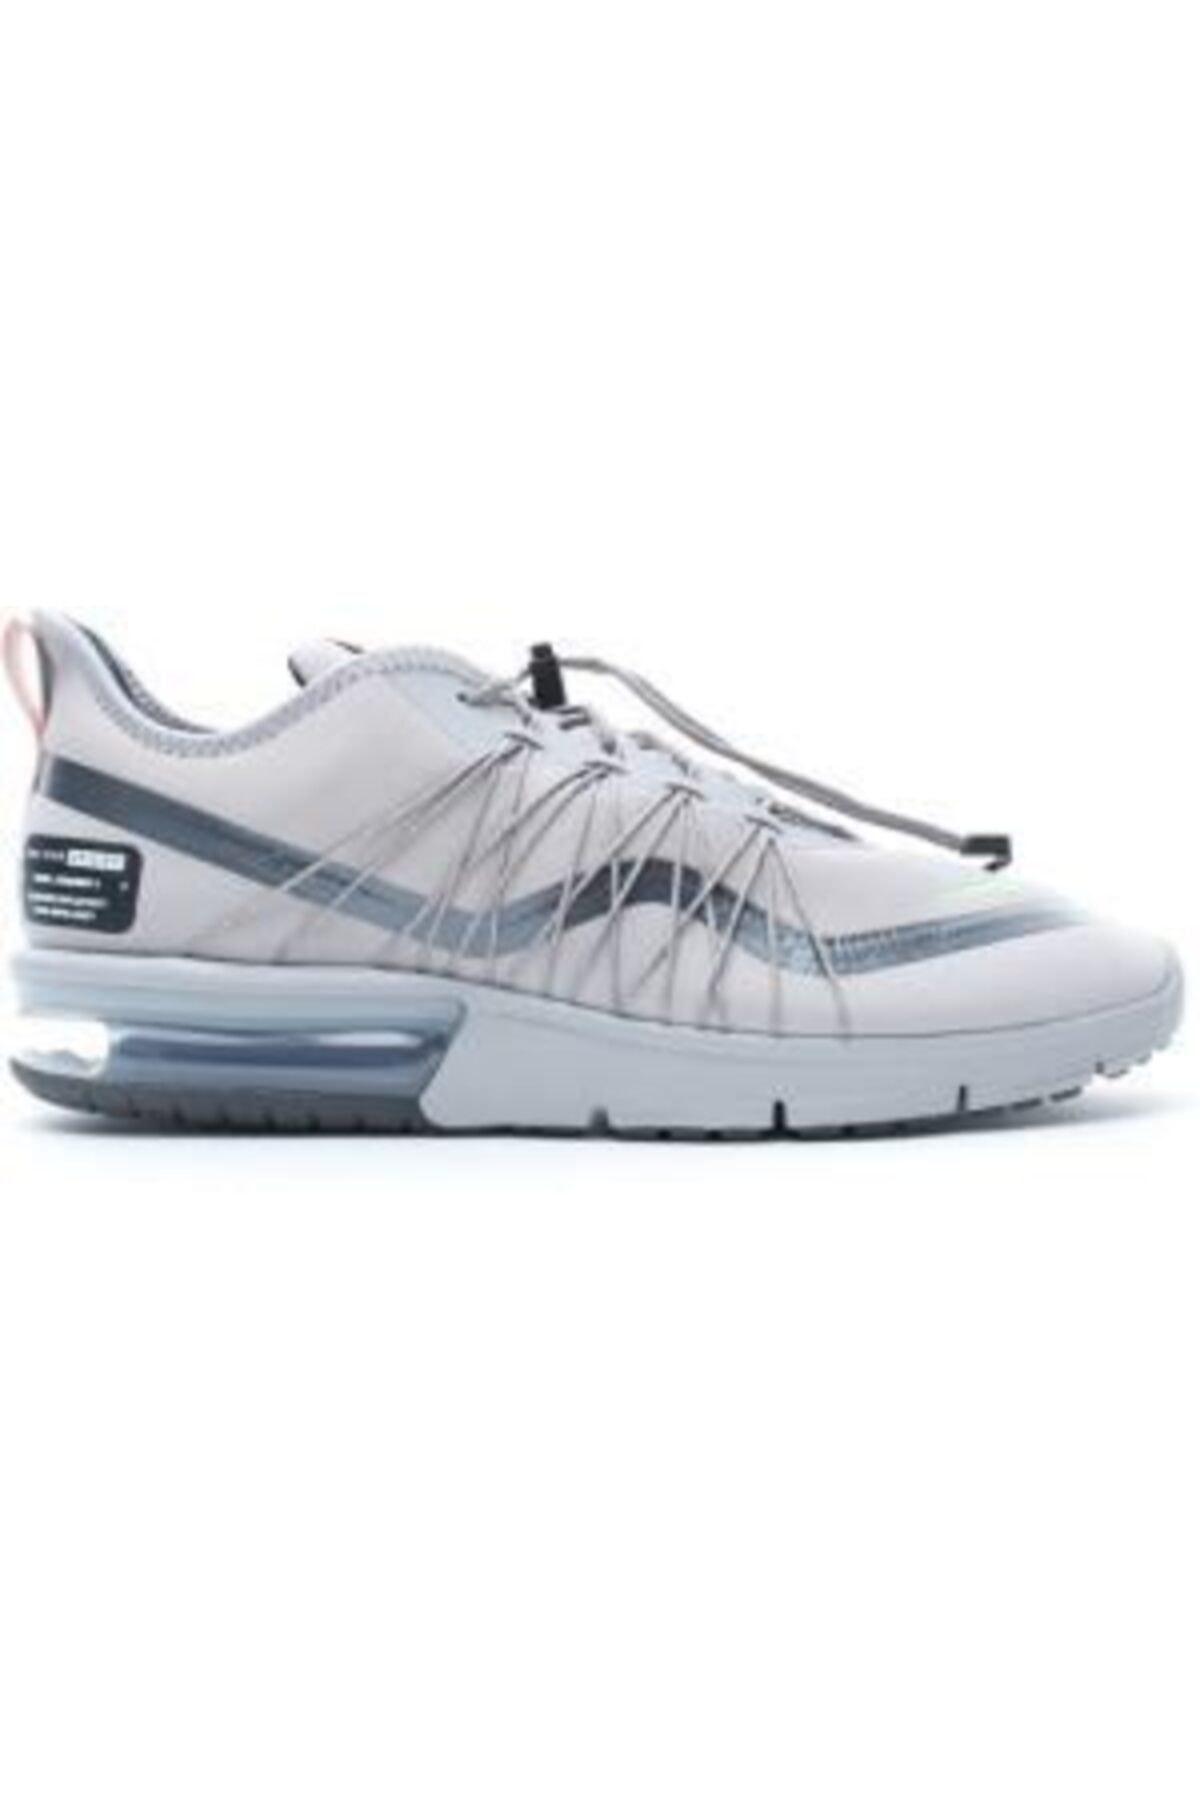 Nike Air Max Sequent 4 Utility Av3236-006 Erkek Günlük Ayakkabı 1